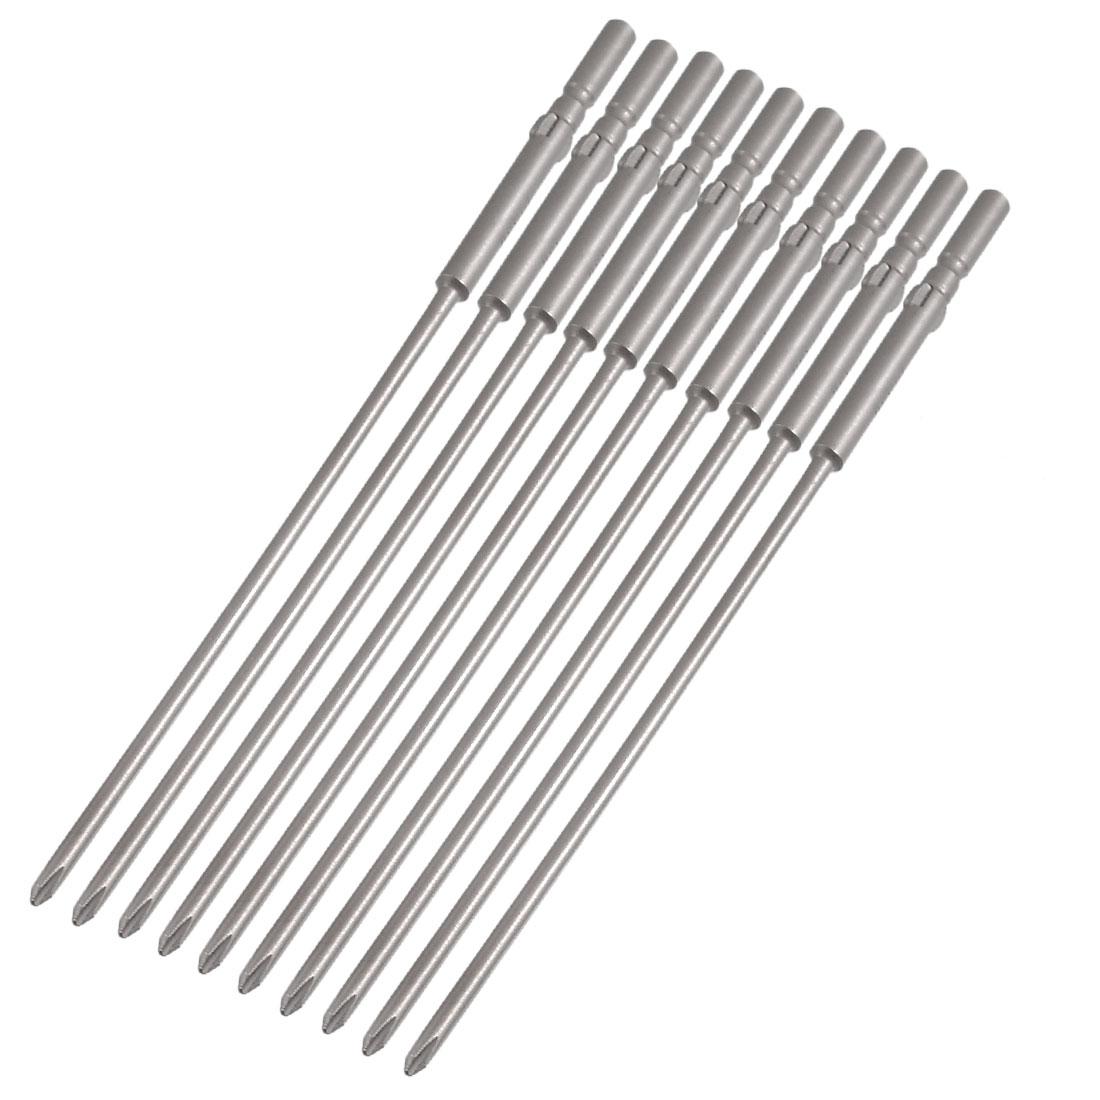 10 Pcs 5mm Shank 150mm Length 3mm Phillips PH1 Magnetic Screwdriver Bits